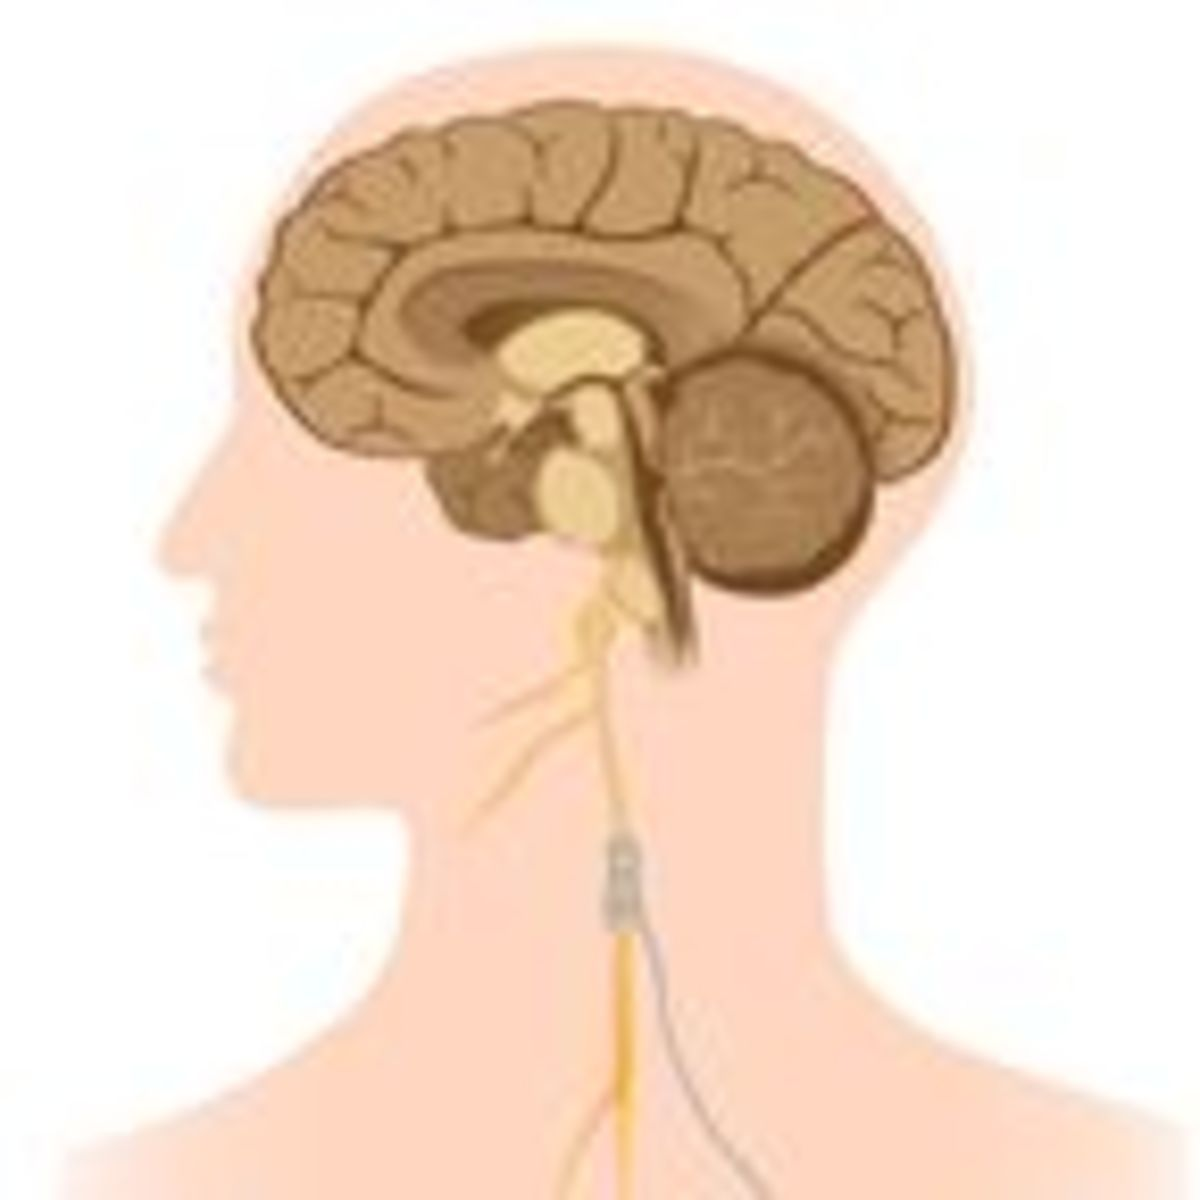 Vagus Nerve Stimulation Holds Promise for Treating Addiction